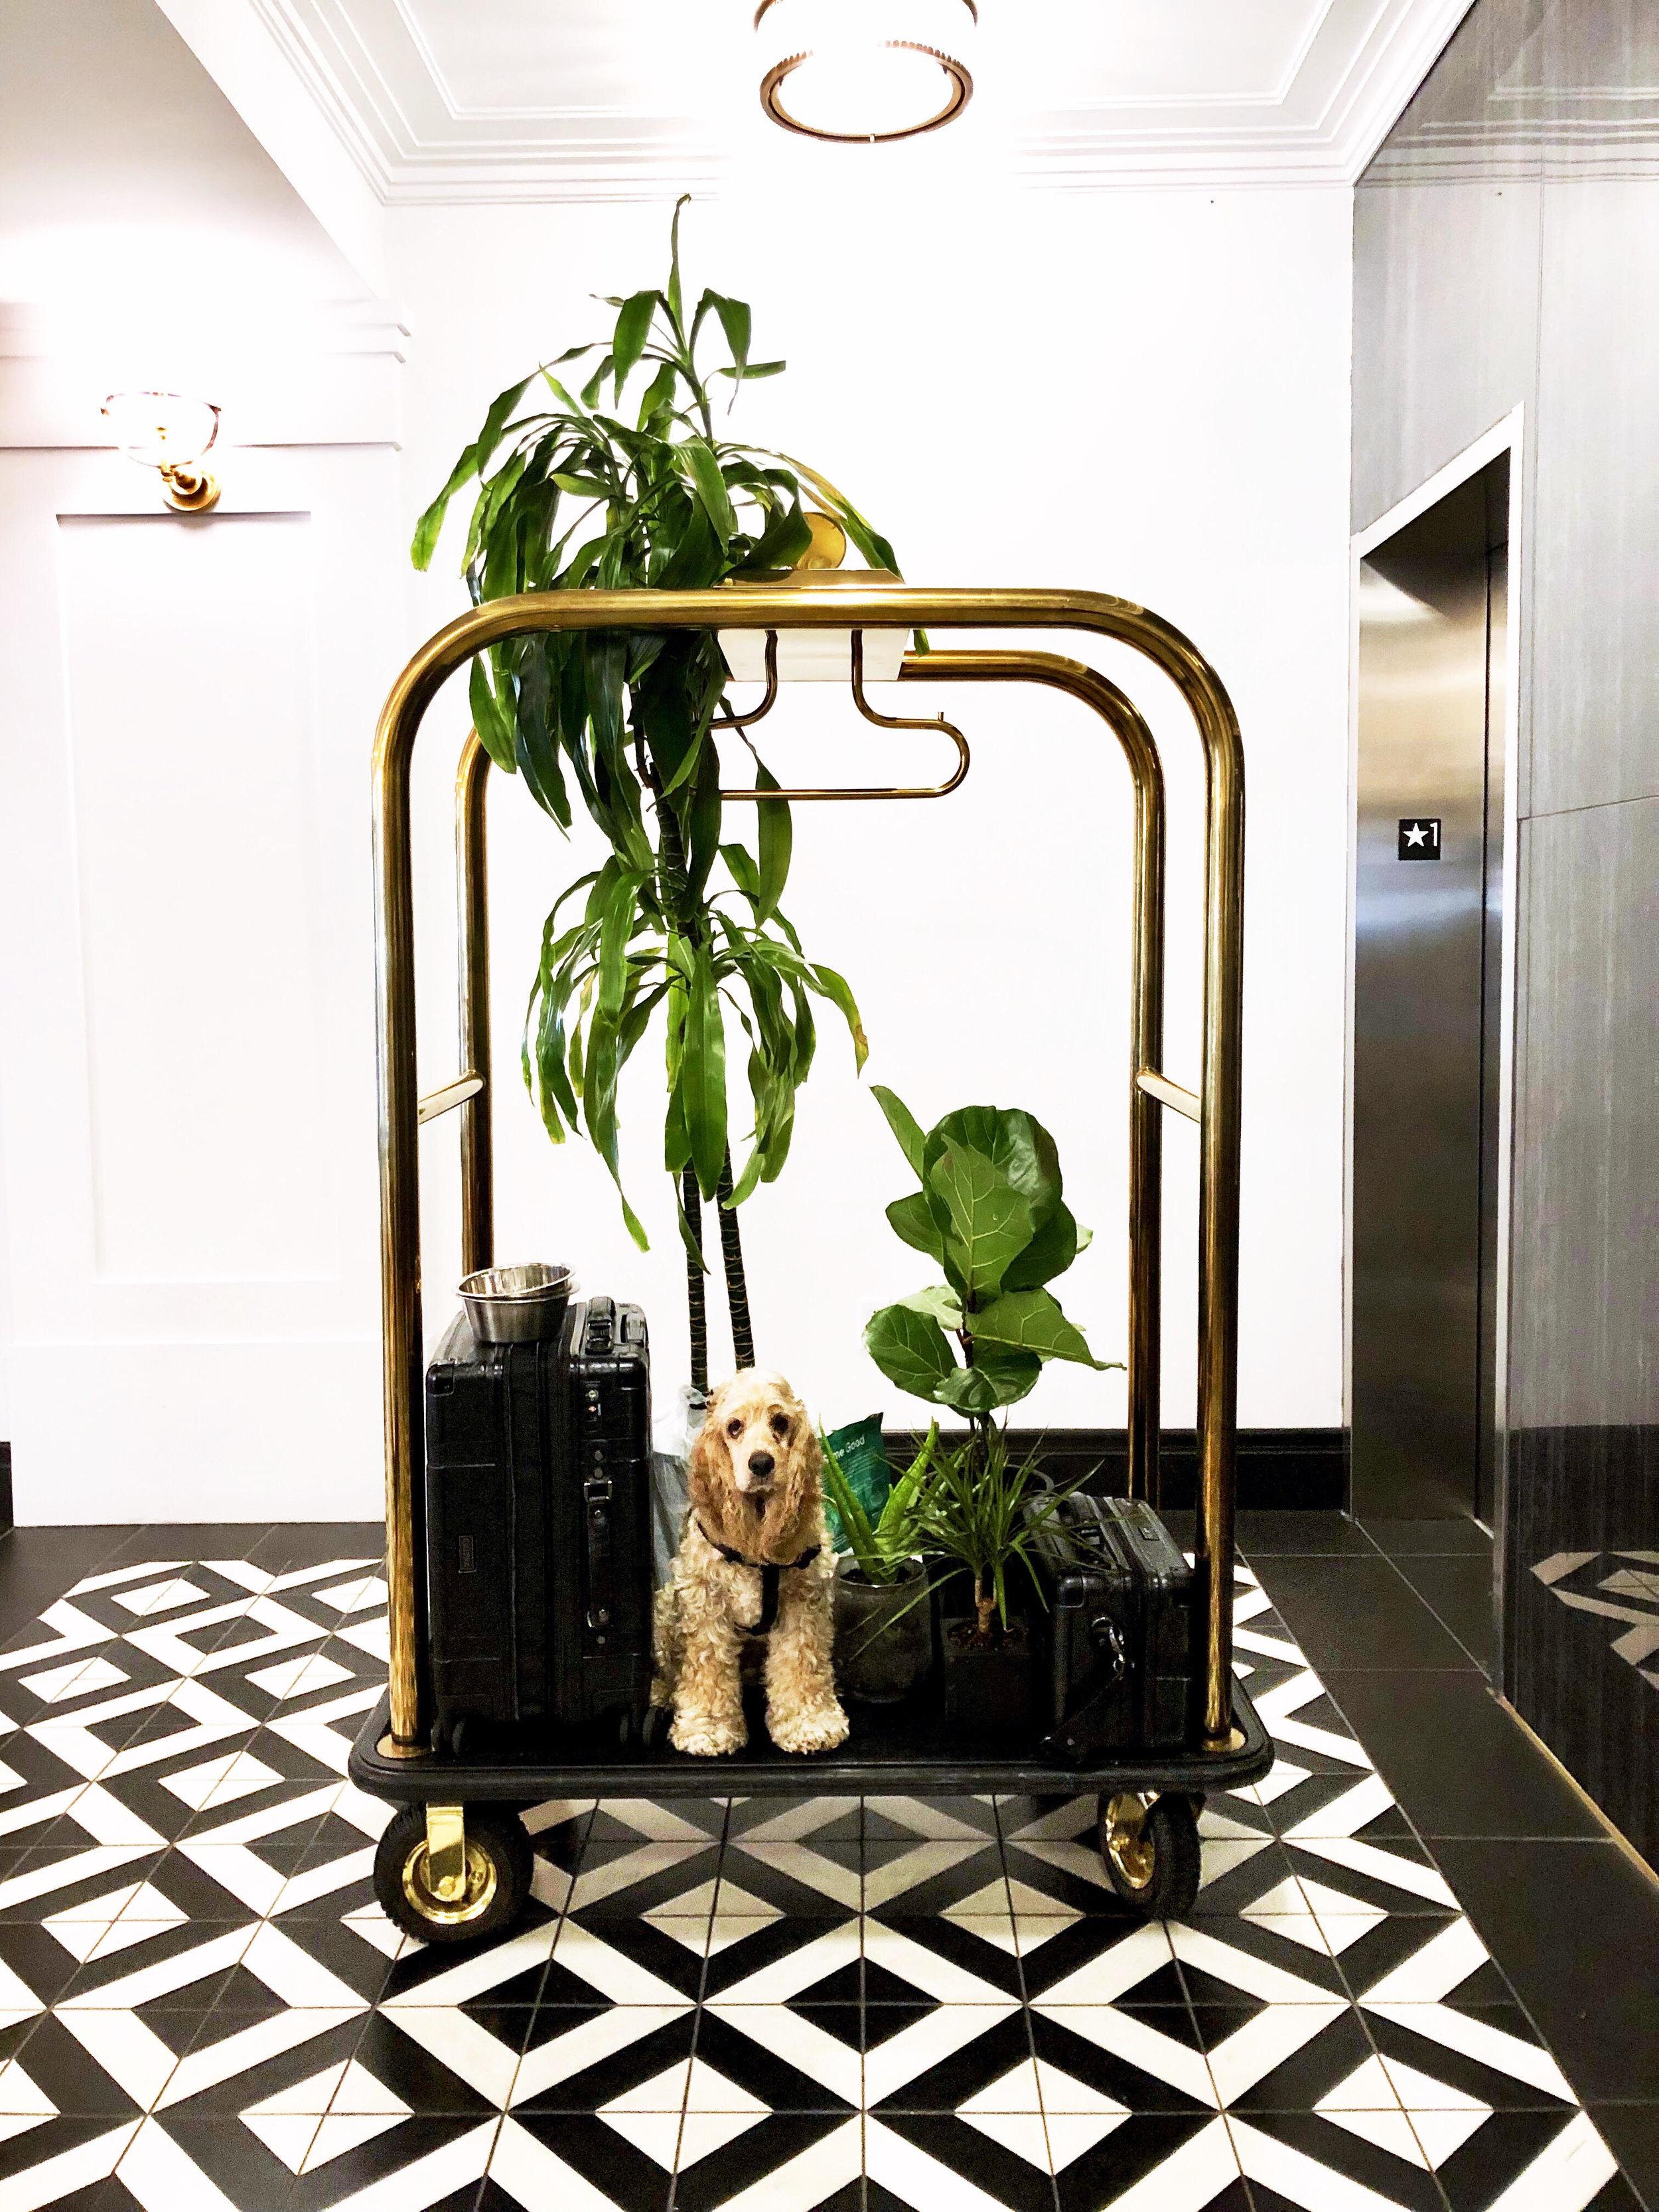 Trnk Luggage + Vanity Case w/ @hachu_thedog -